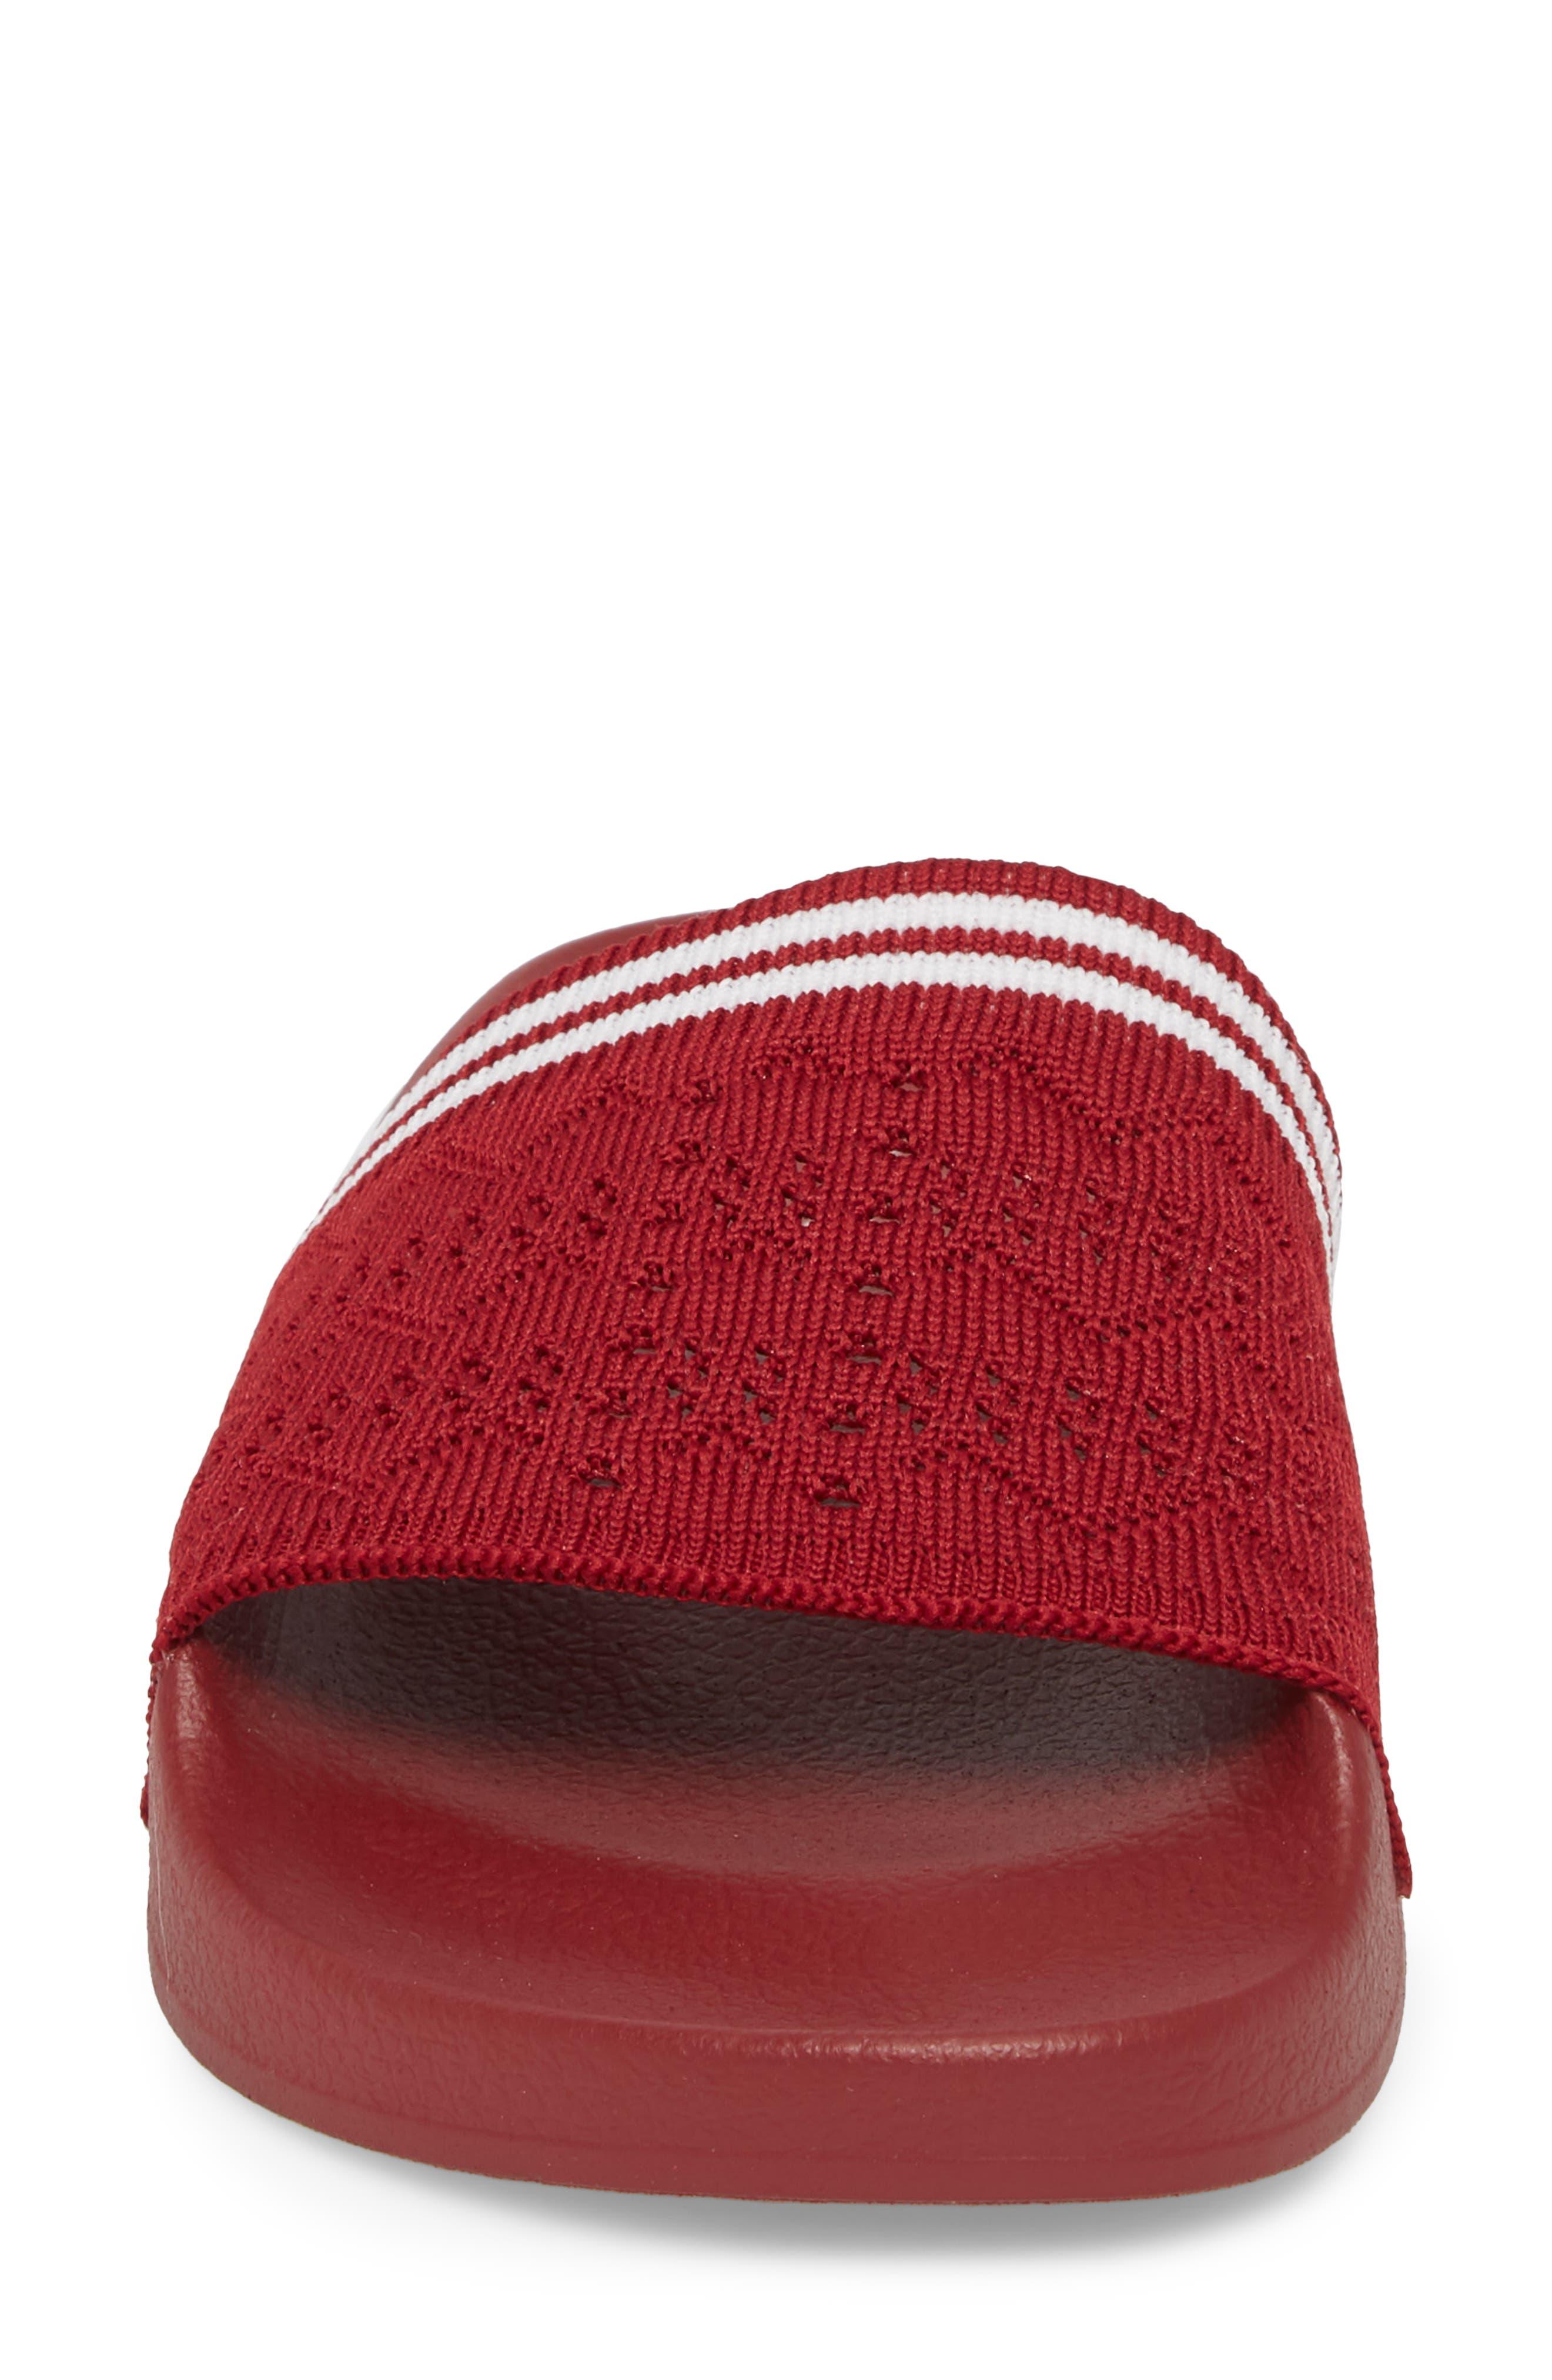 Vibe Sock Knit Slide Sandal,                             Alternate thumbnail 19, color,